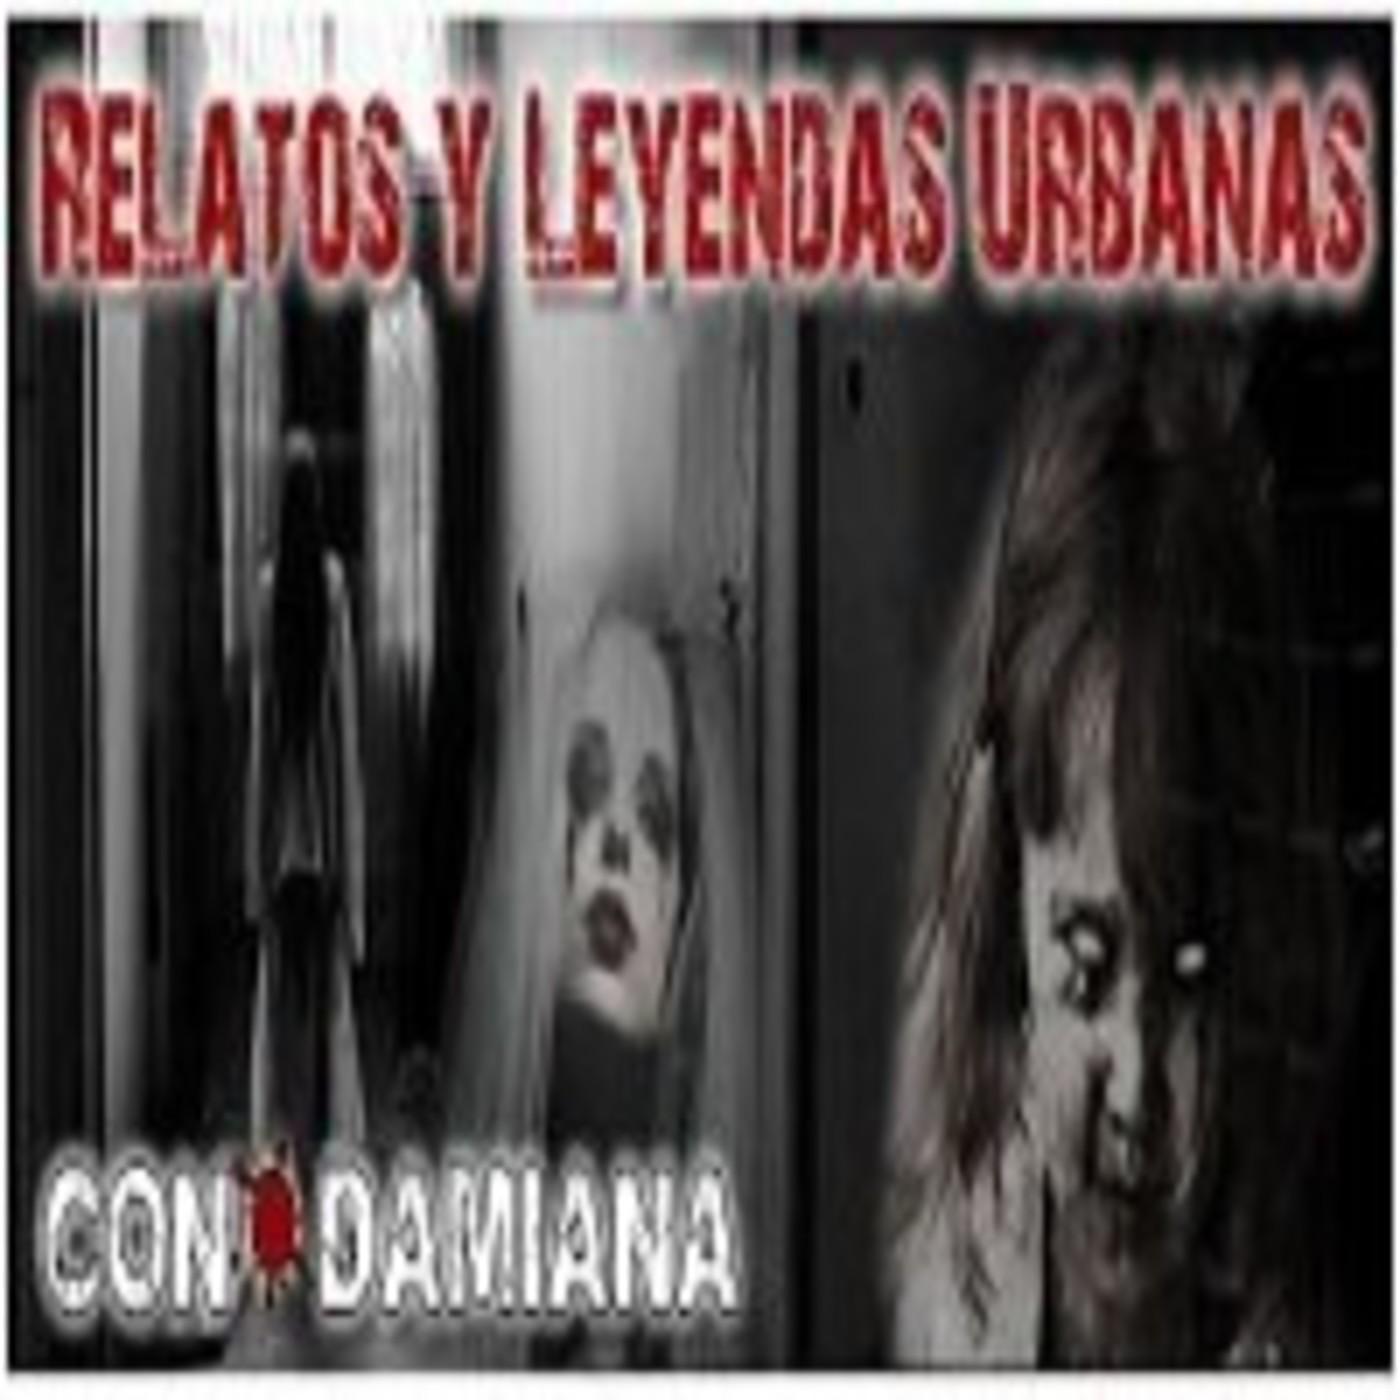 Relatos Y Leyendas Urbanas Segundo Programa (Damiana,Dorian, Ruben) La Cripta.